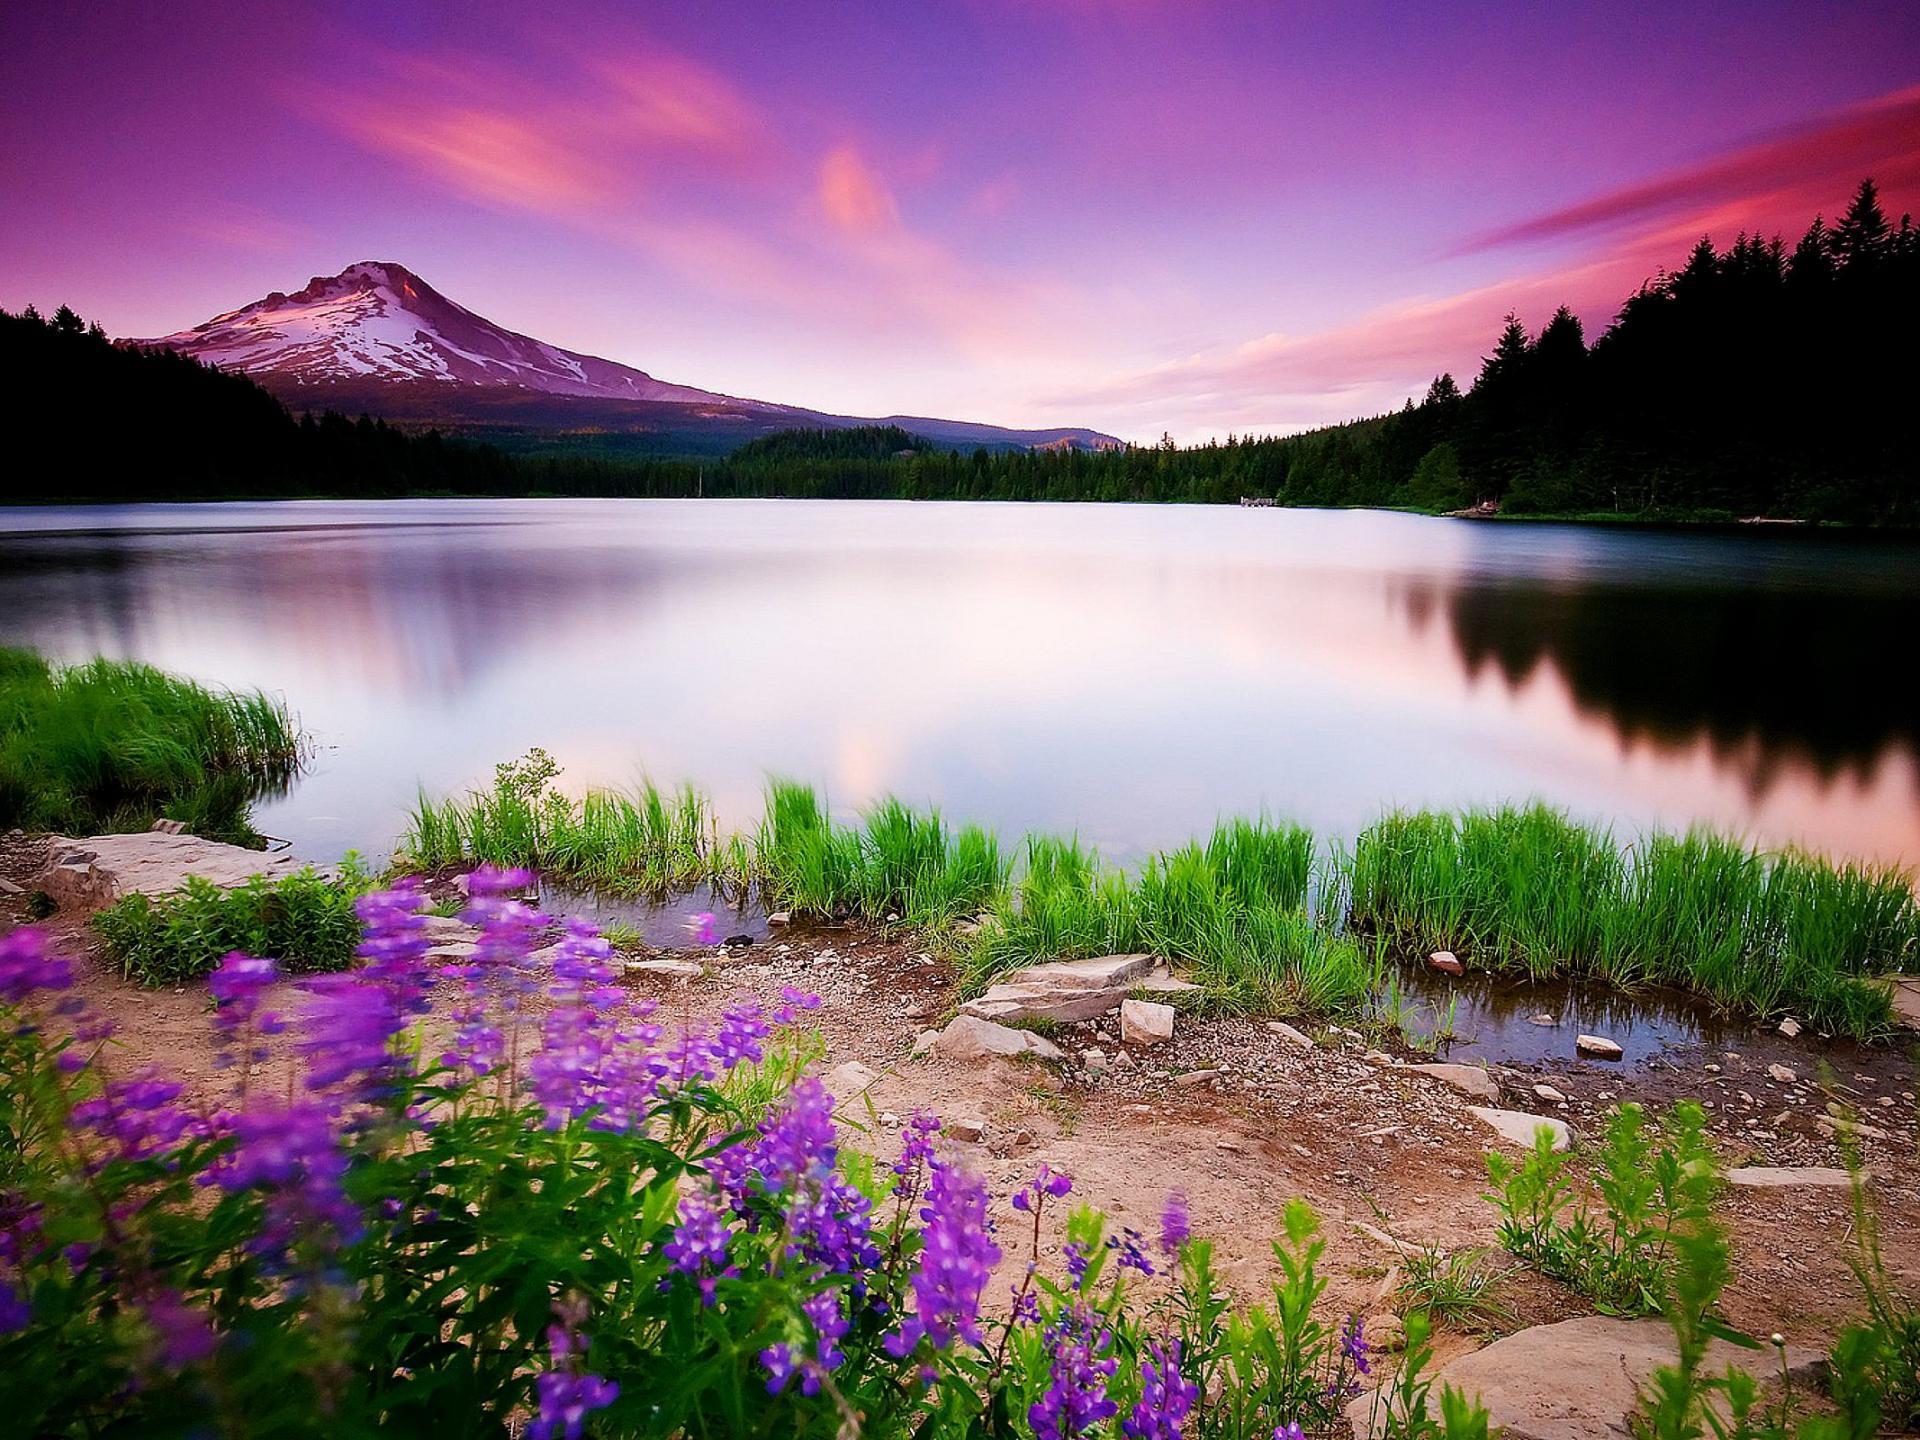 Beautiful view wallpaper hd HD Wallpaper 1920x1440